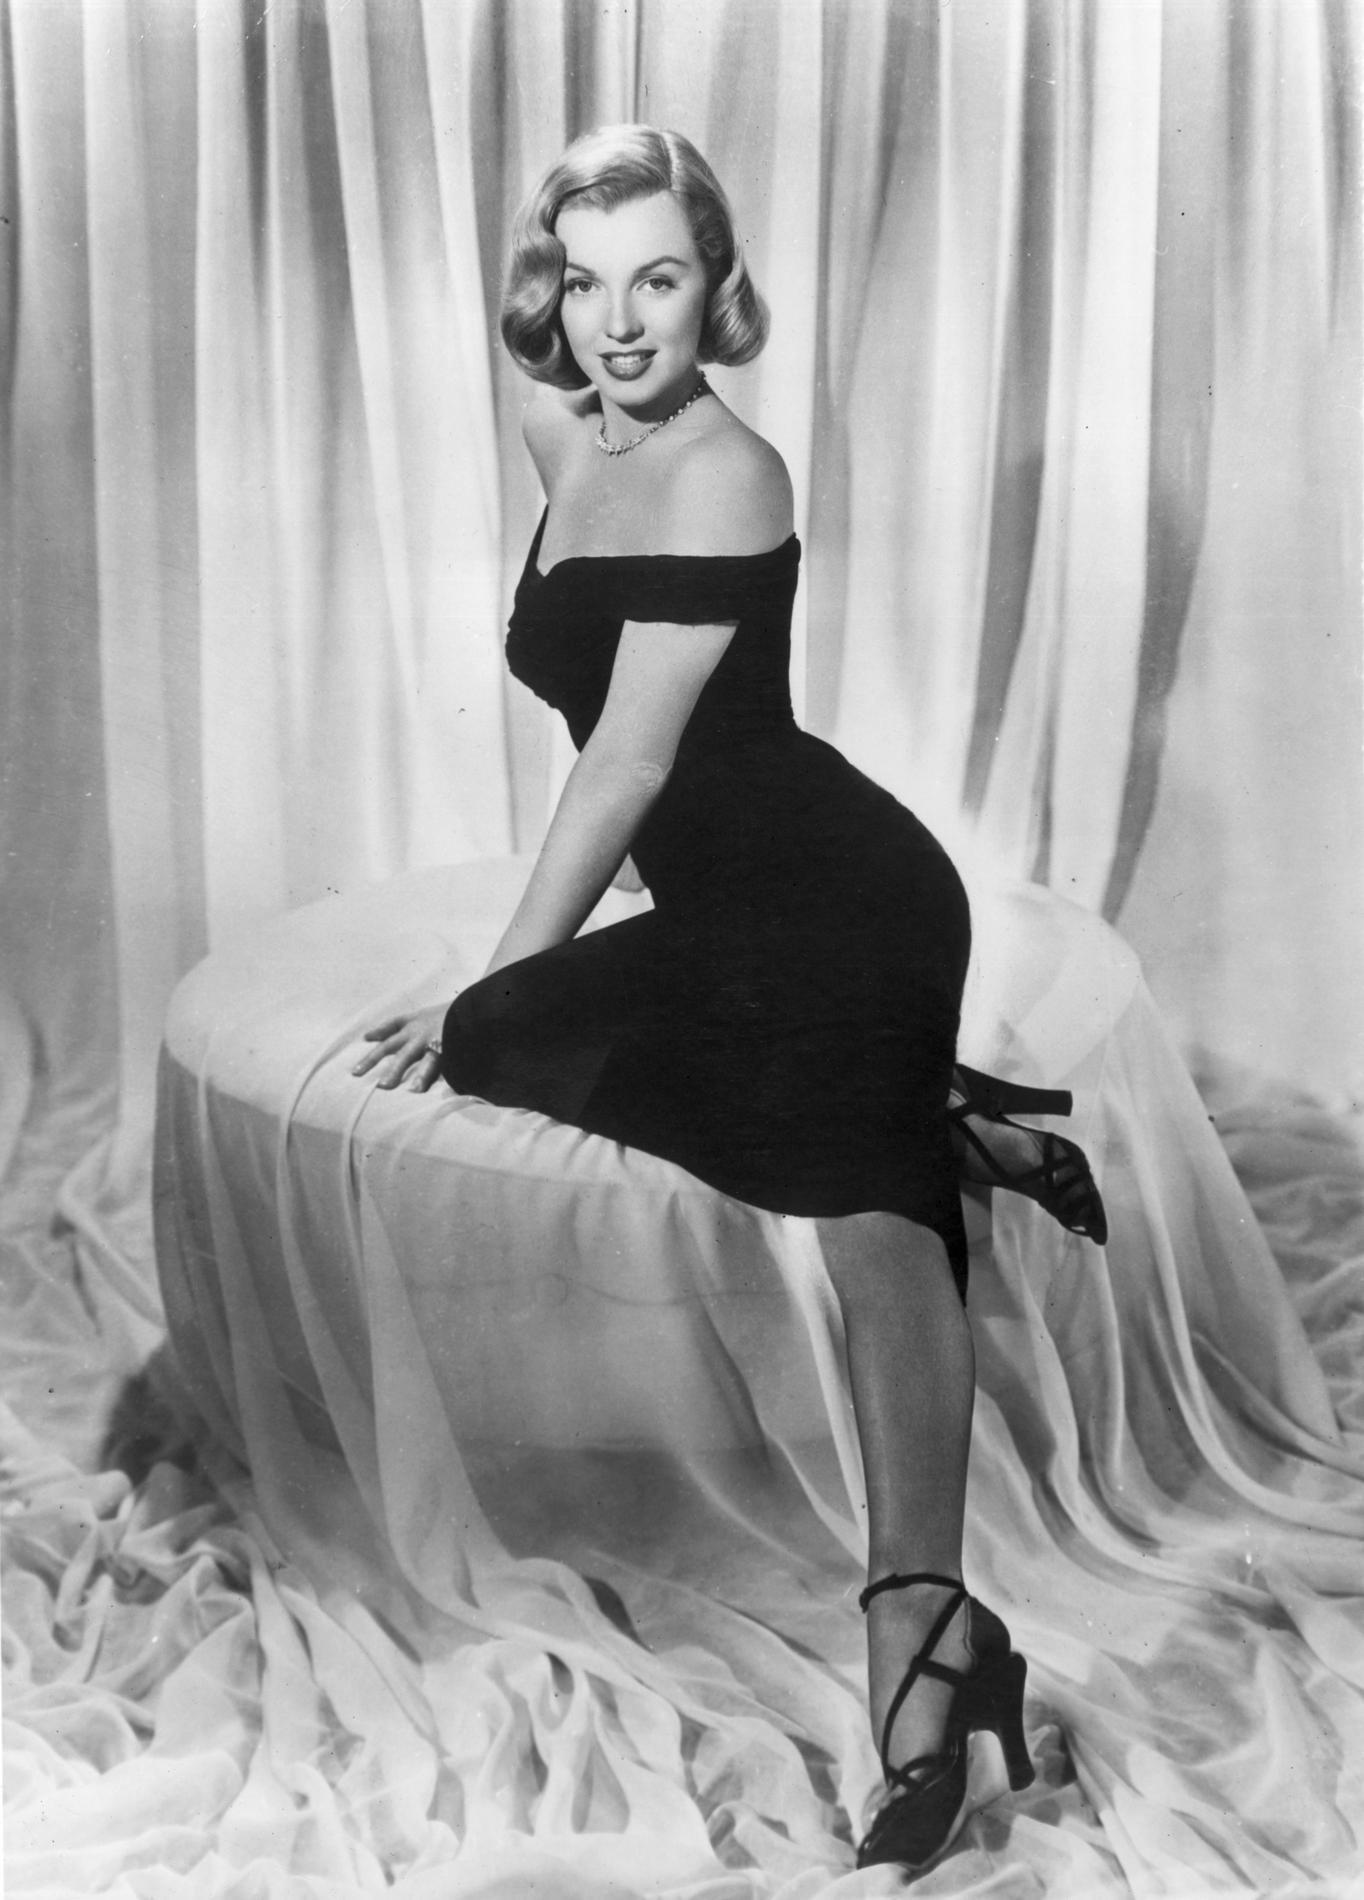 Marilyn monroe ses robes mythiques vendues aux ench res madame figaro - Housse de couette marylin monroe ...